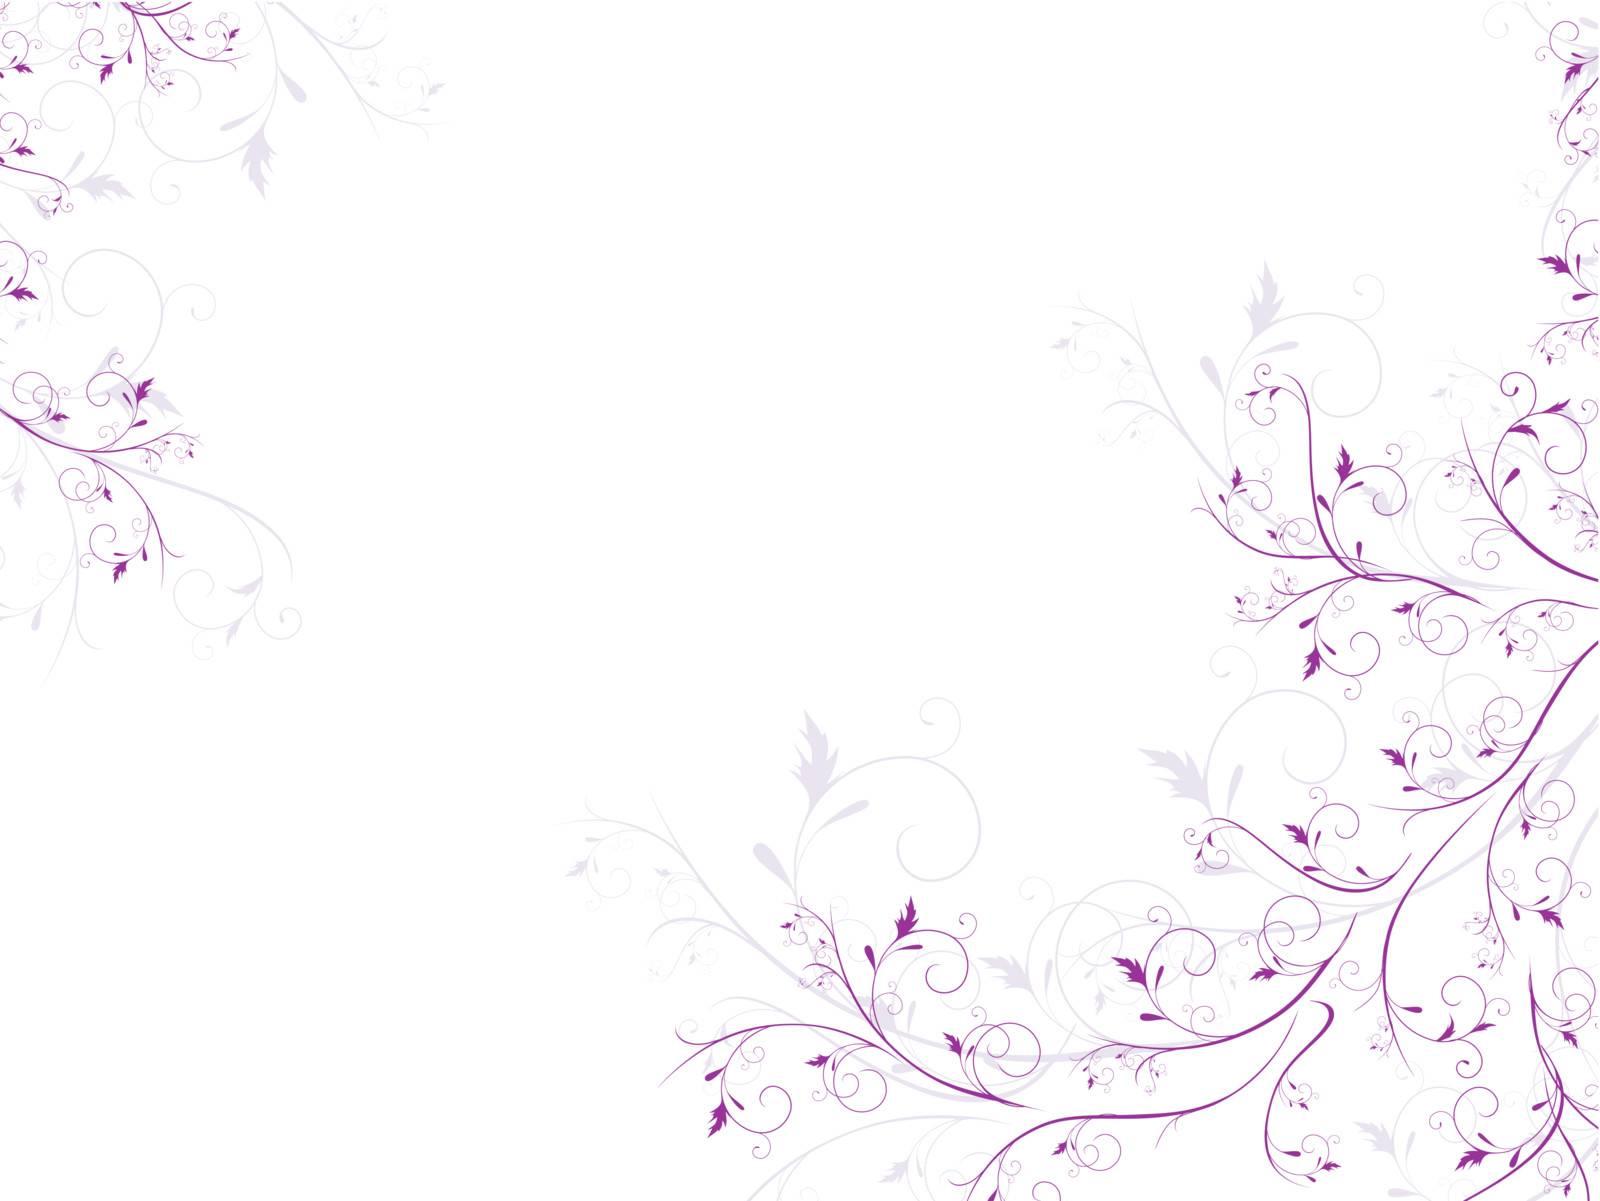 illustration of floral frame with swirls in violet